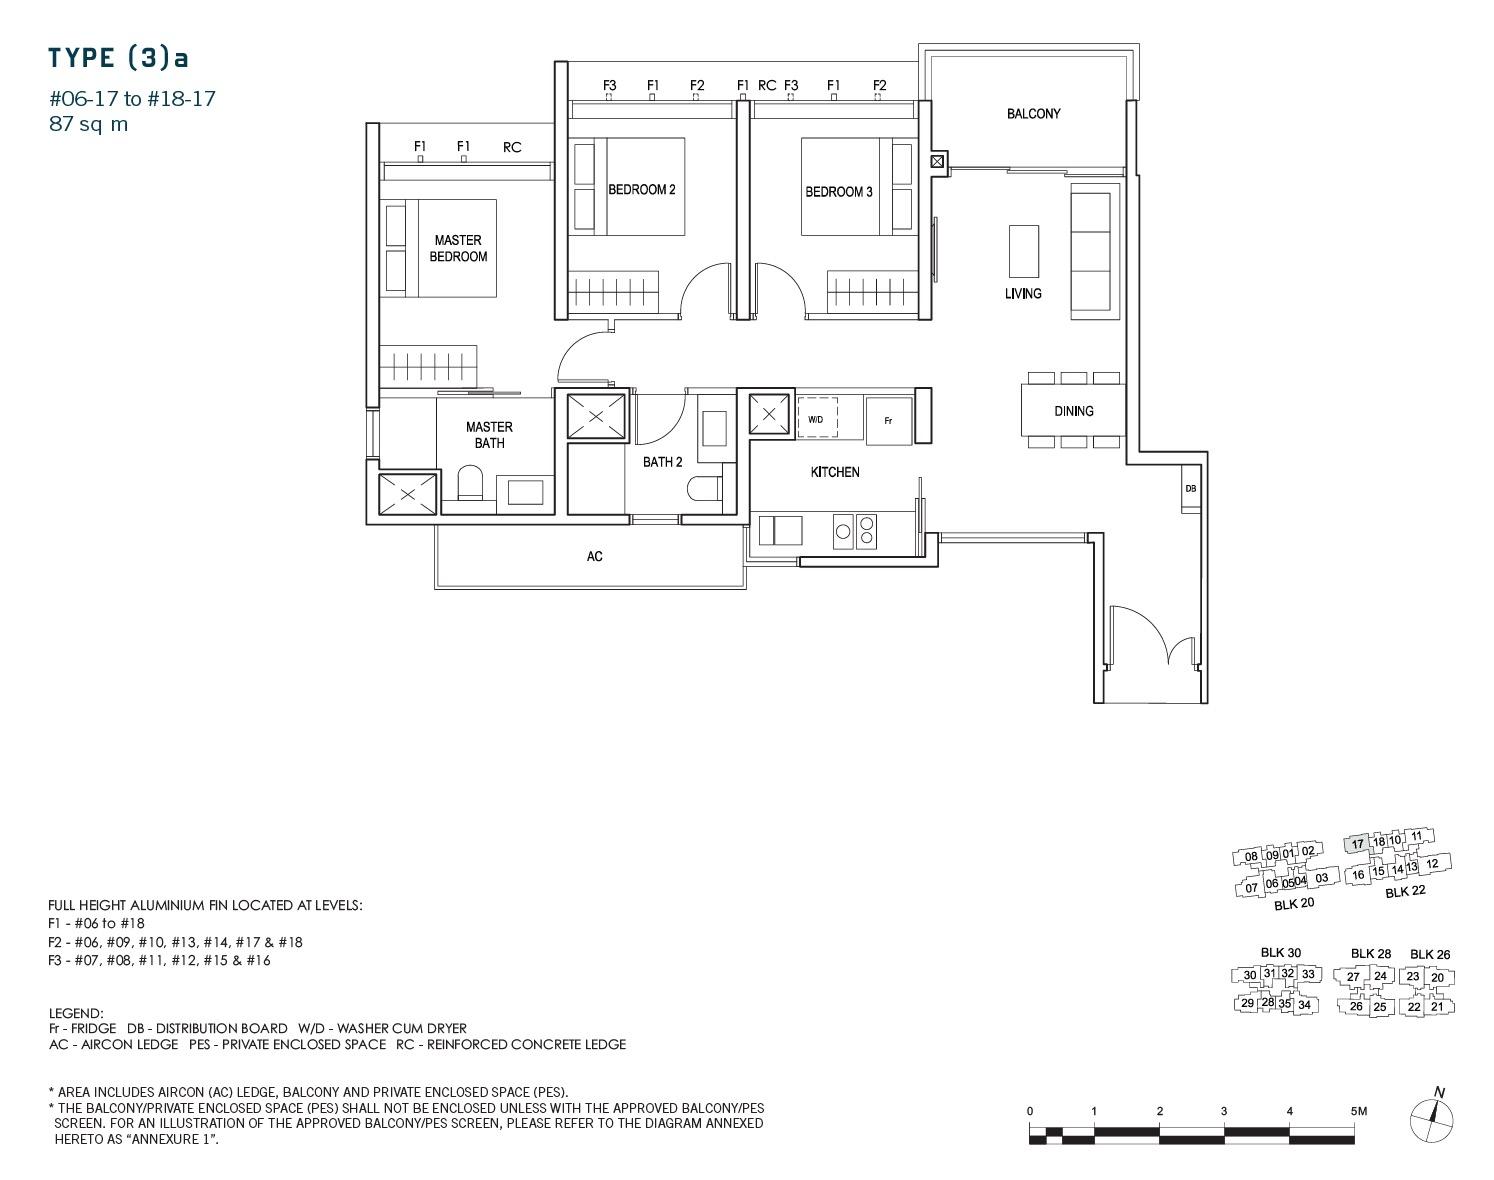 penrose-sims-floorplan 3BR